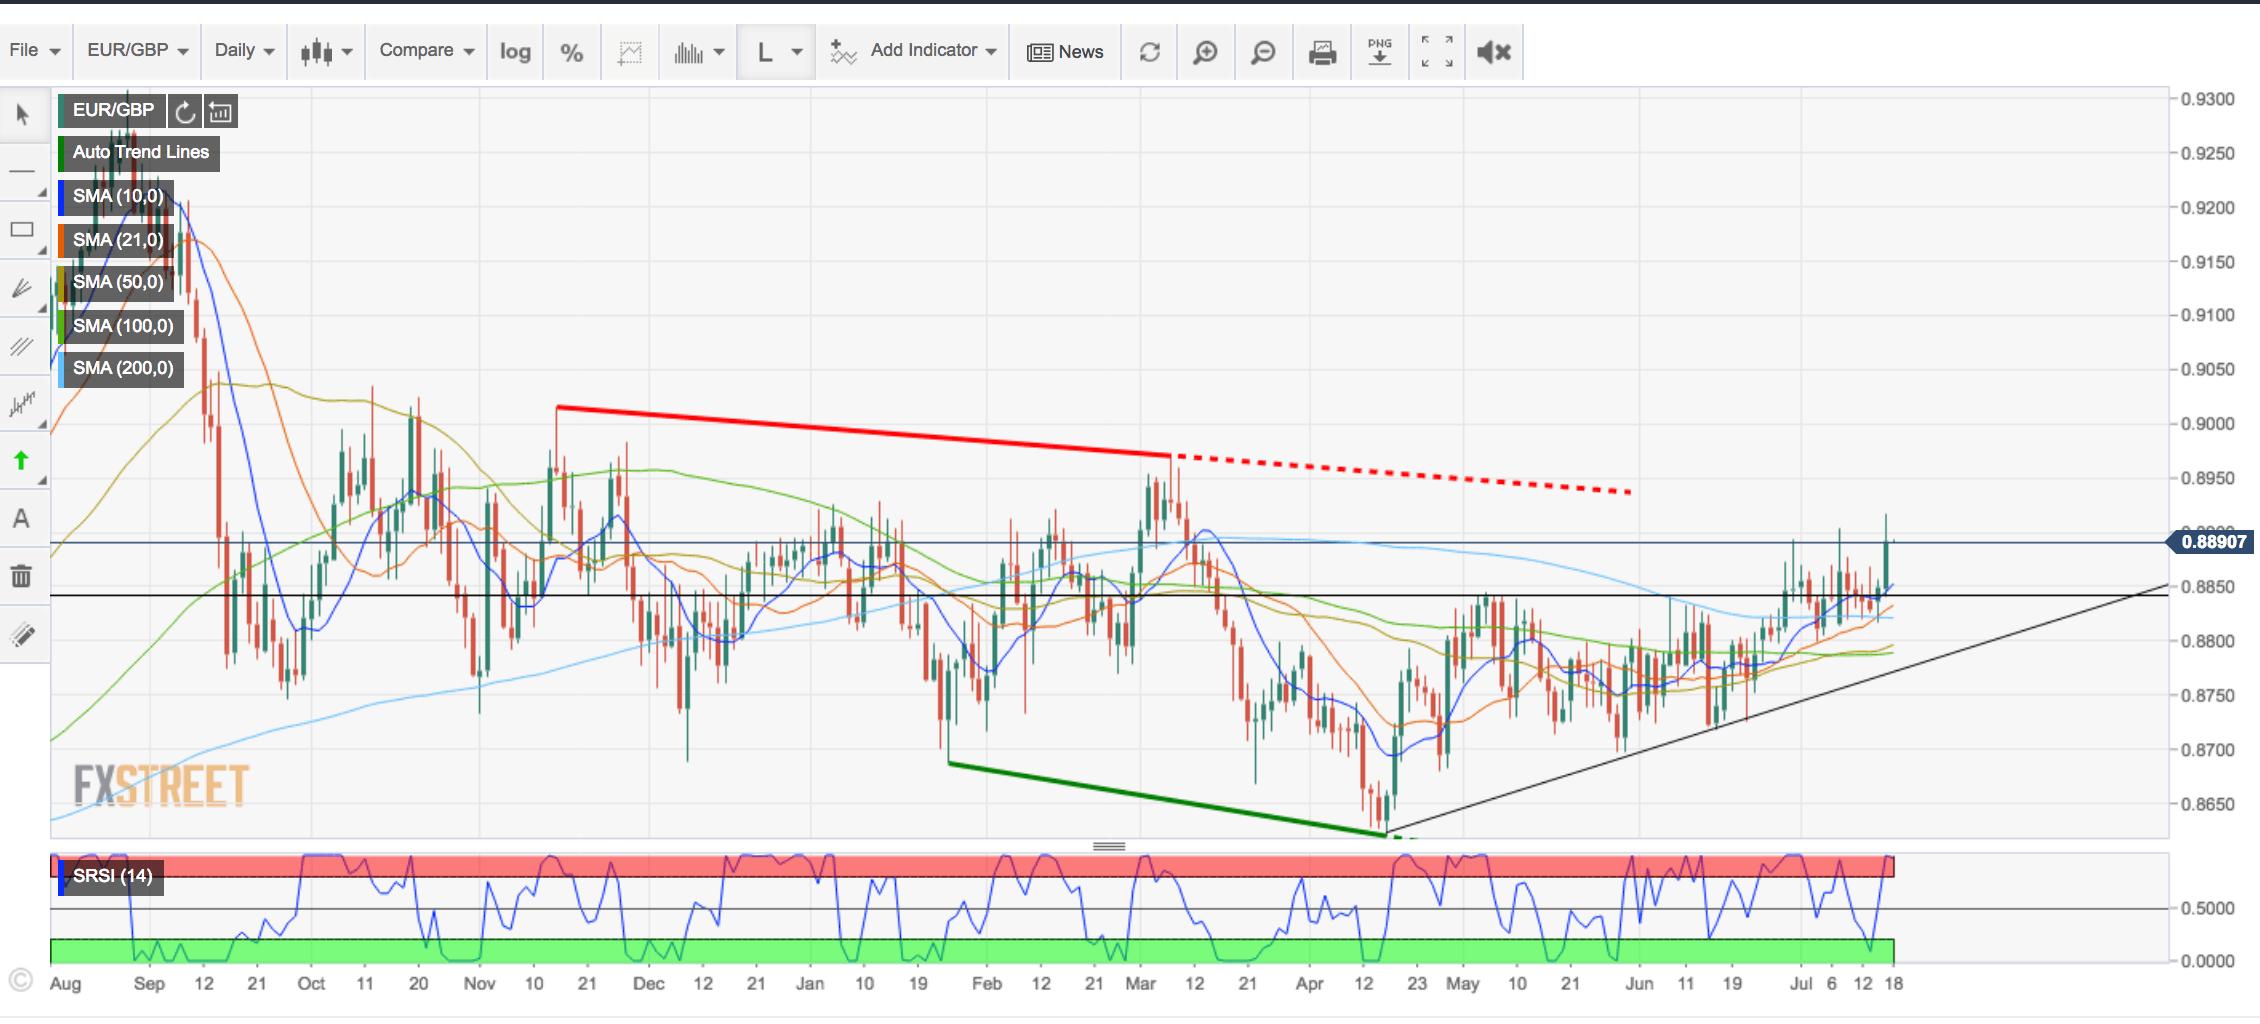 Eur Gbp Technicalysis Price Making Bullish Tracks Above Bearish Triangle Resistance